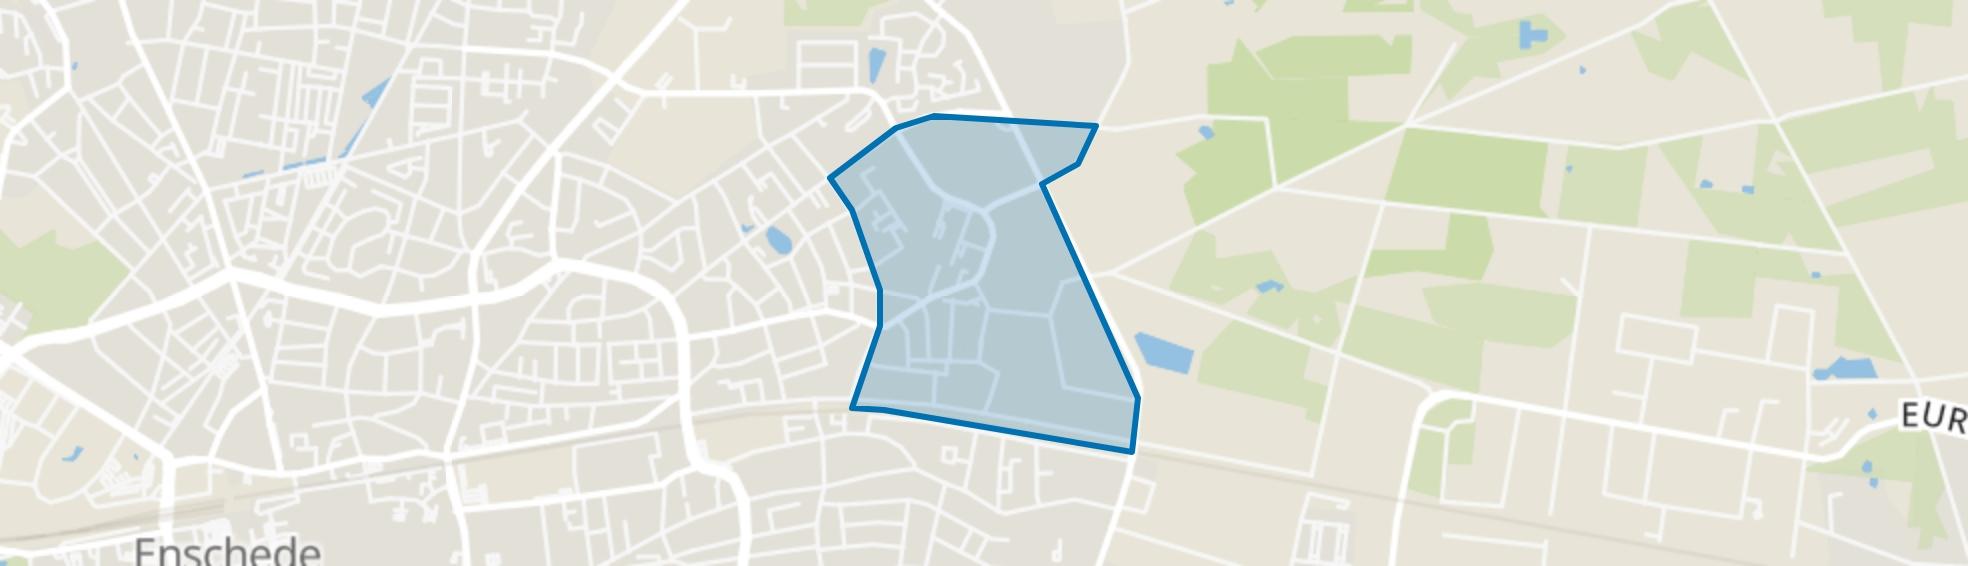 Park Stokhorst, Enschede map